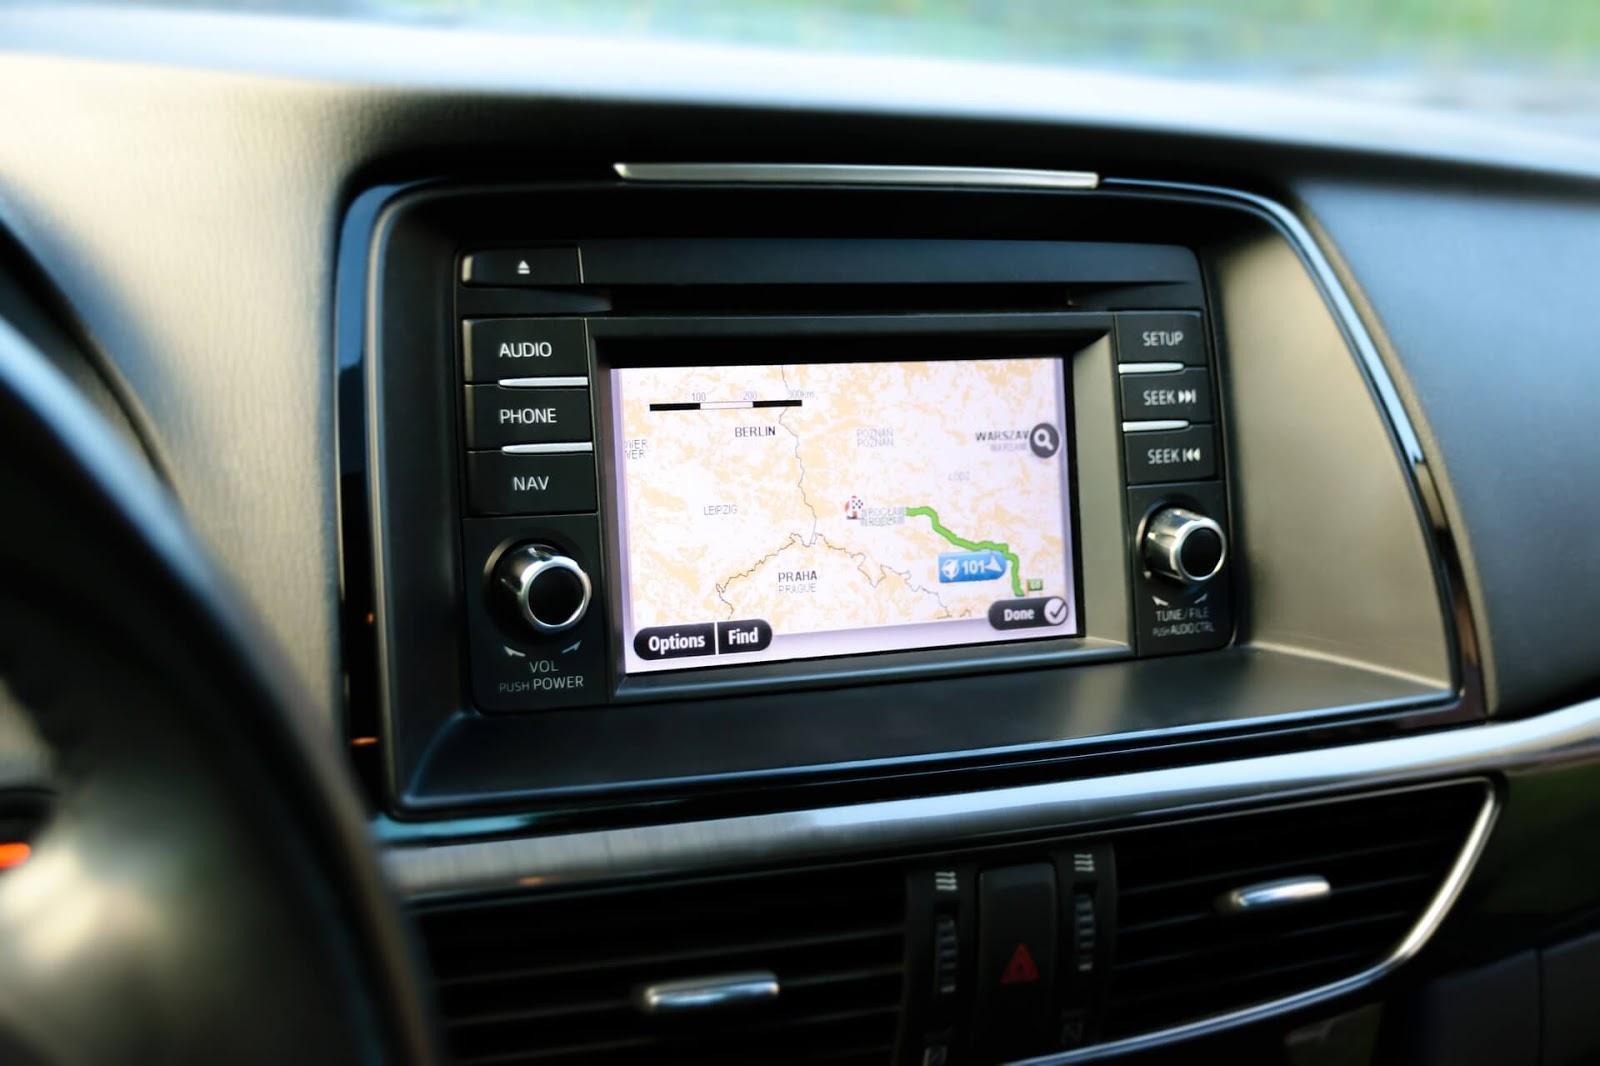 GPS navigation screen in a car